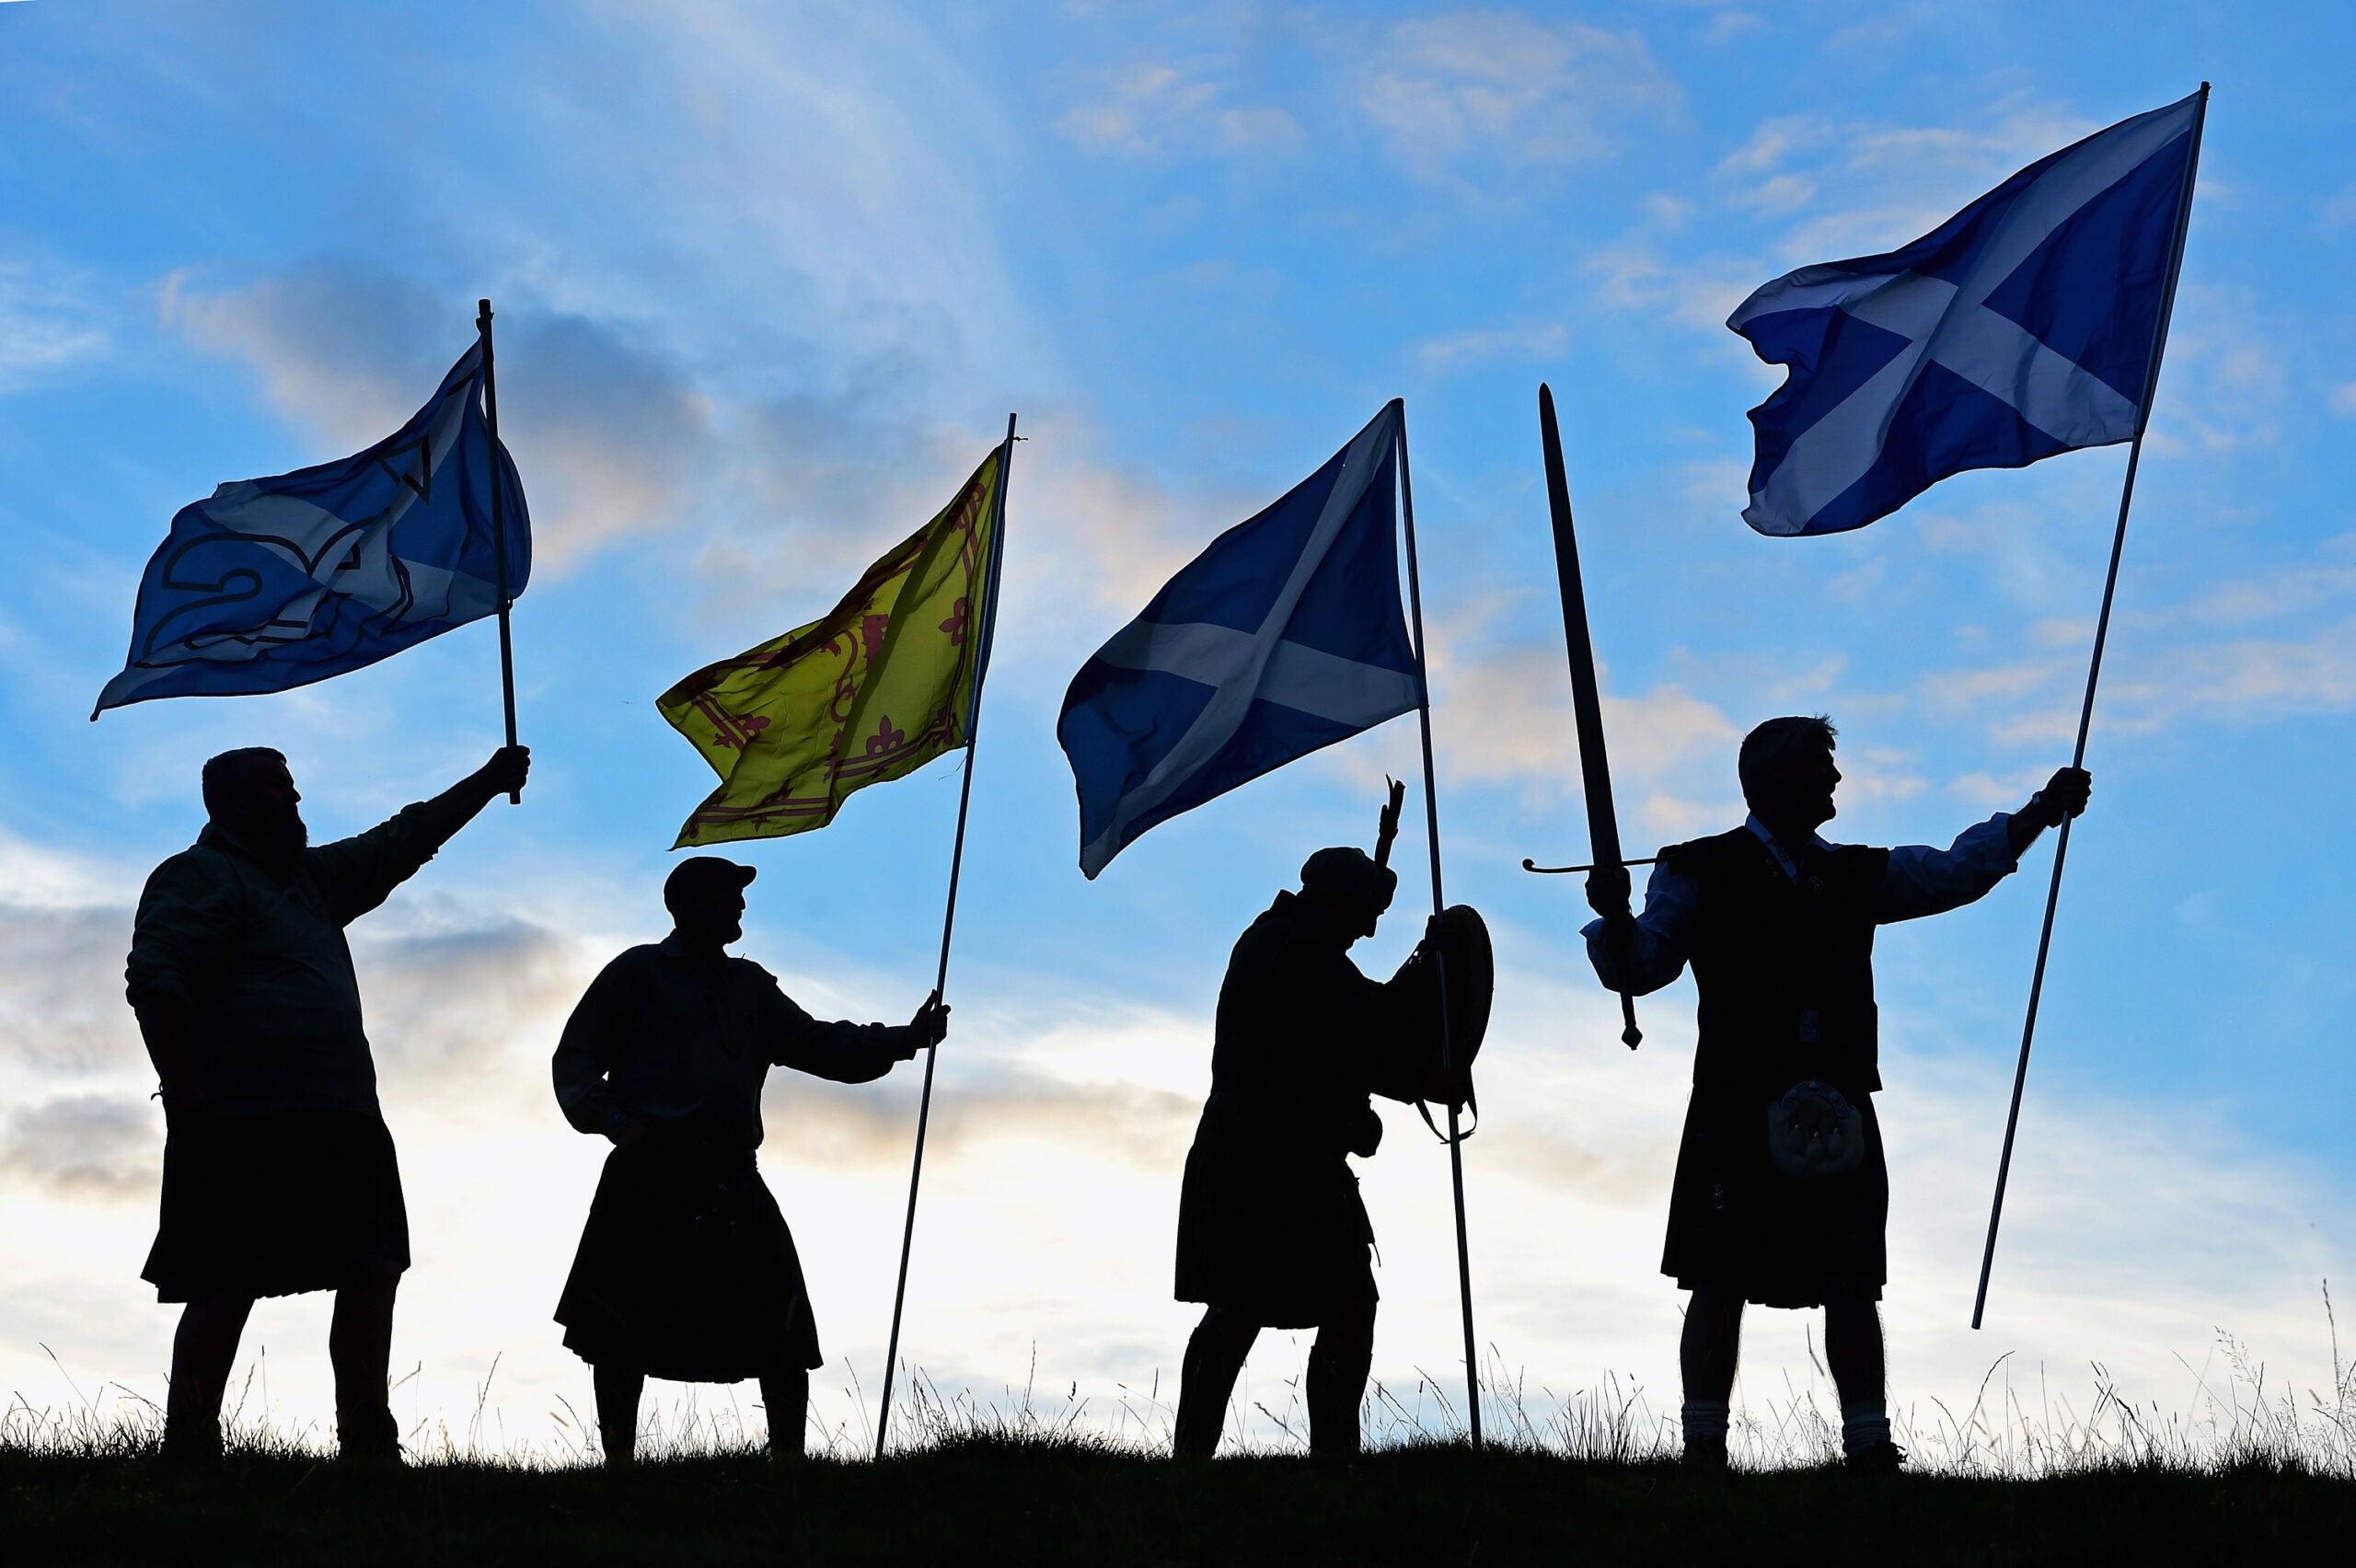 Nicola Sturgeon should not assume that demography is destiny